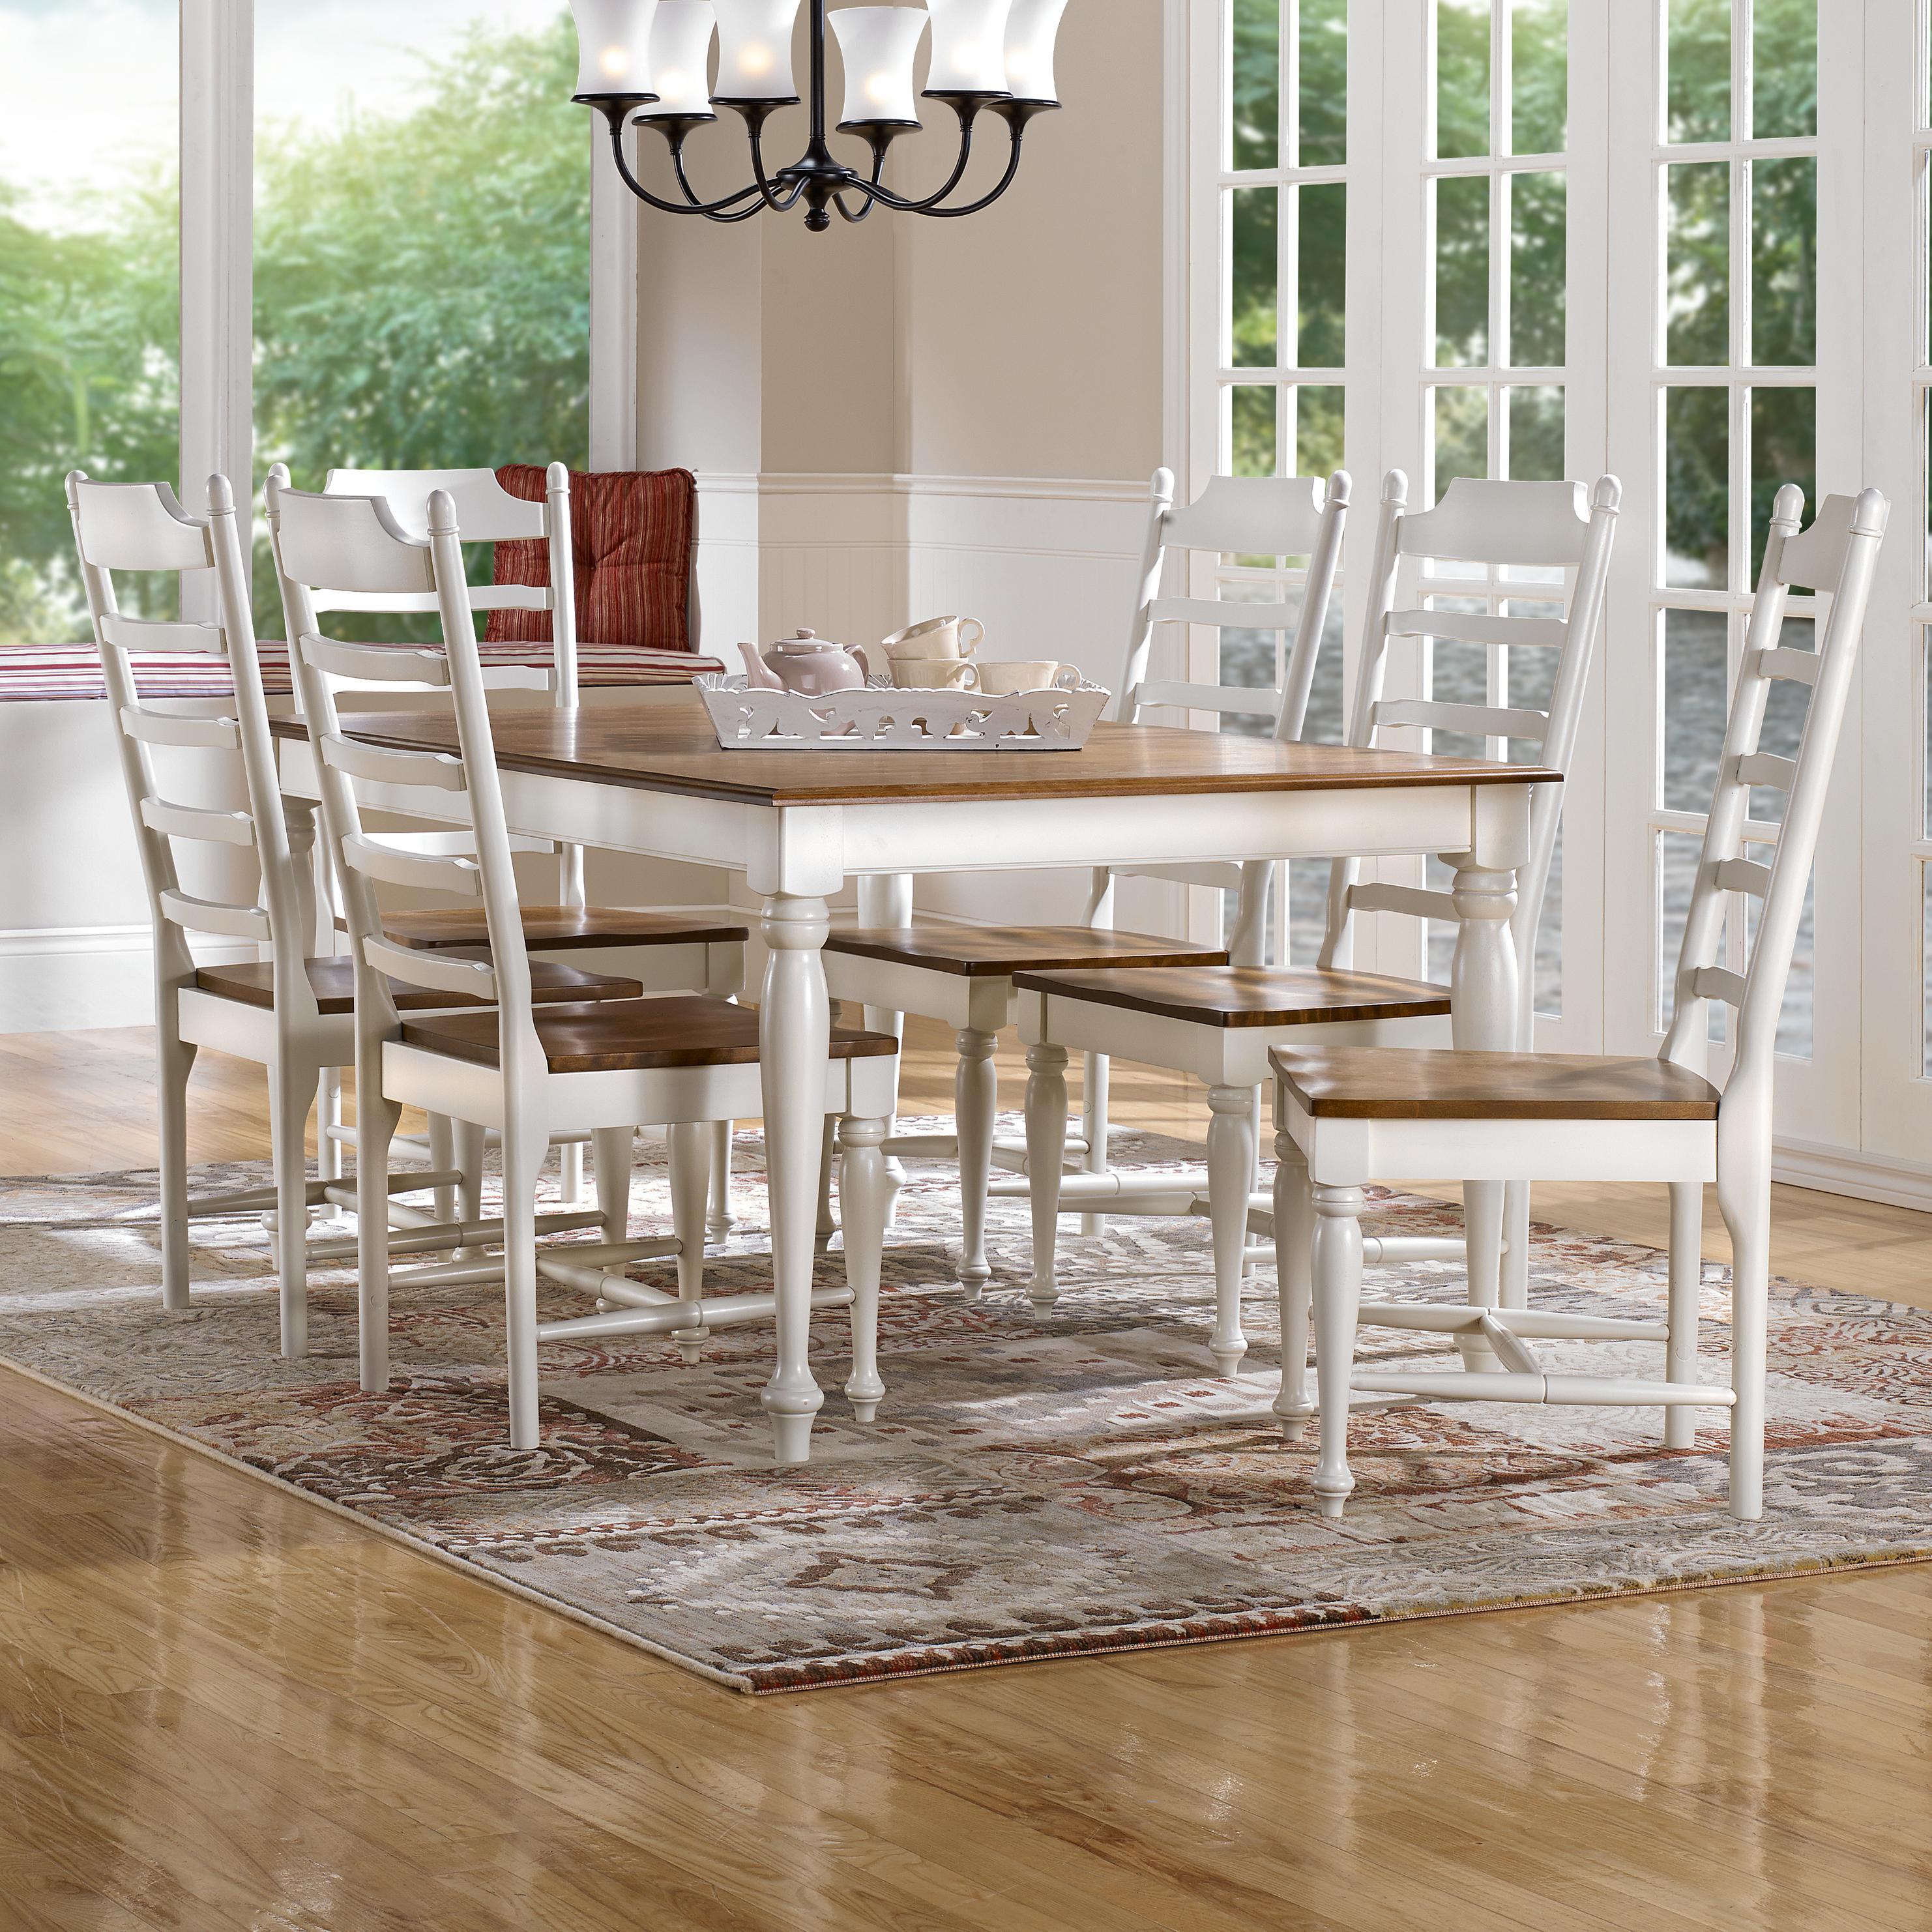 canadel gourmet custom dining customizable rectangular table set belfort furniture dining. Black Bedroom Furniture Sets. Home Design Ideas